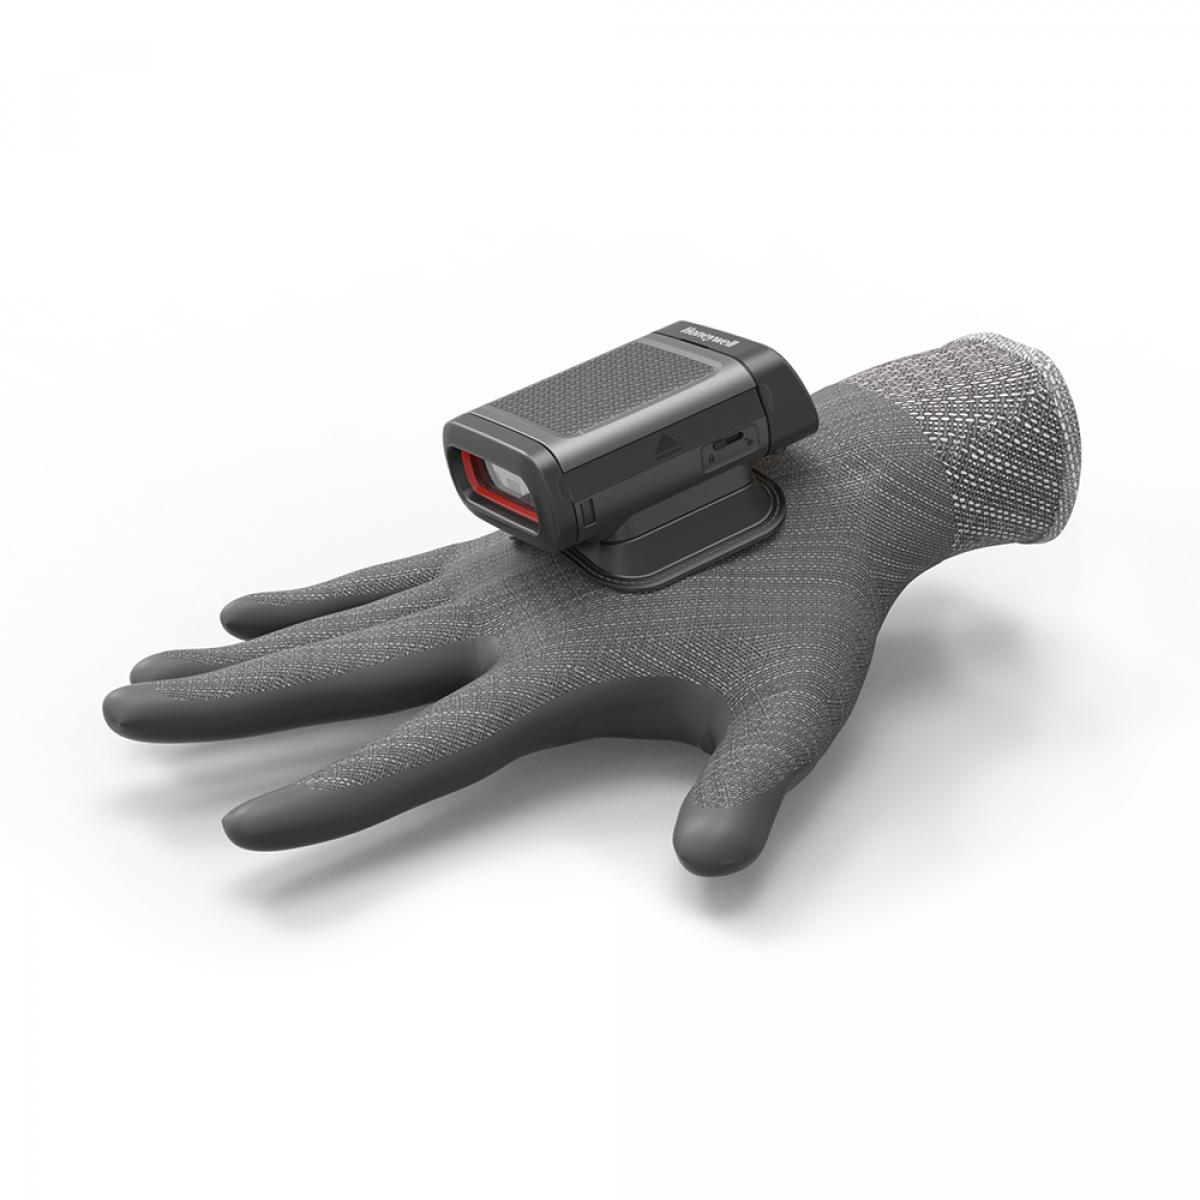 Wearable glove mount for-Honeywell 8680i ring scanner